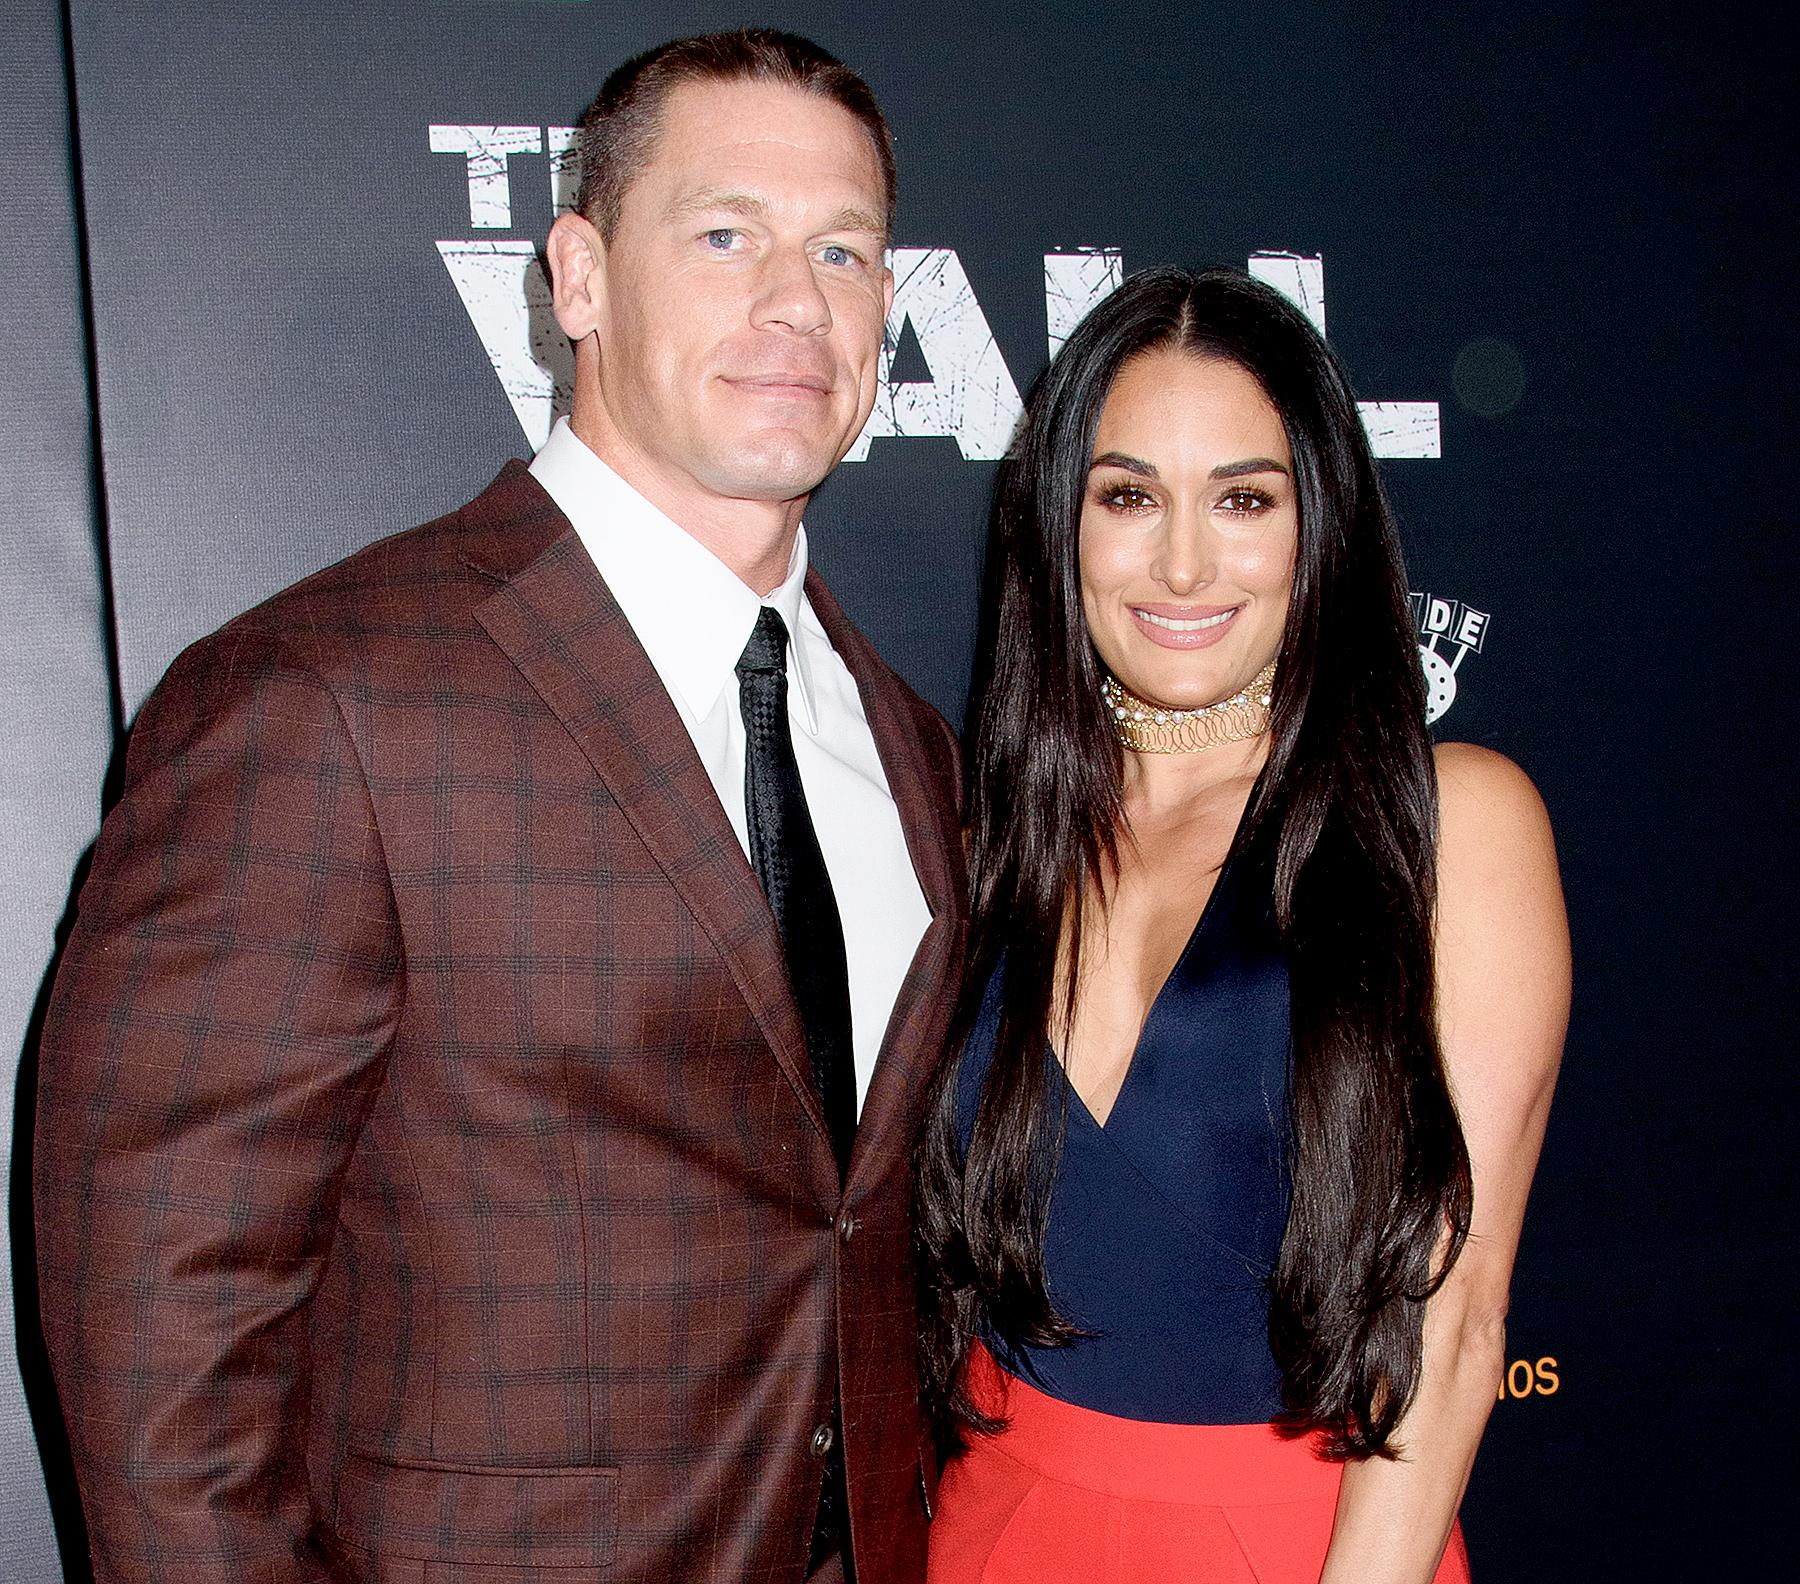 cbeee4ac50eb John Cena Tweets About No Regrets Amid Nikki Bella Split Rumors